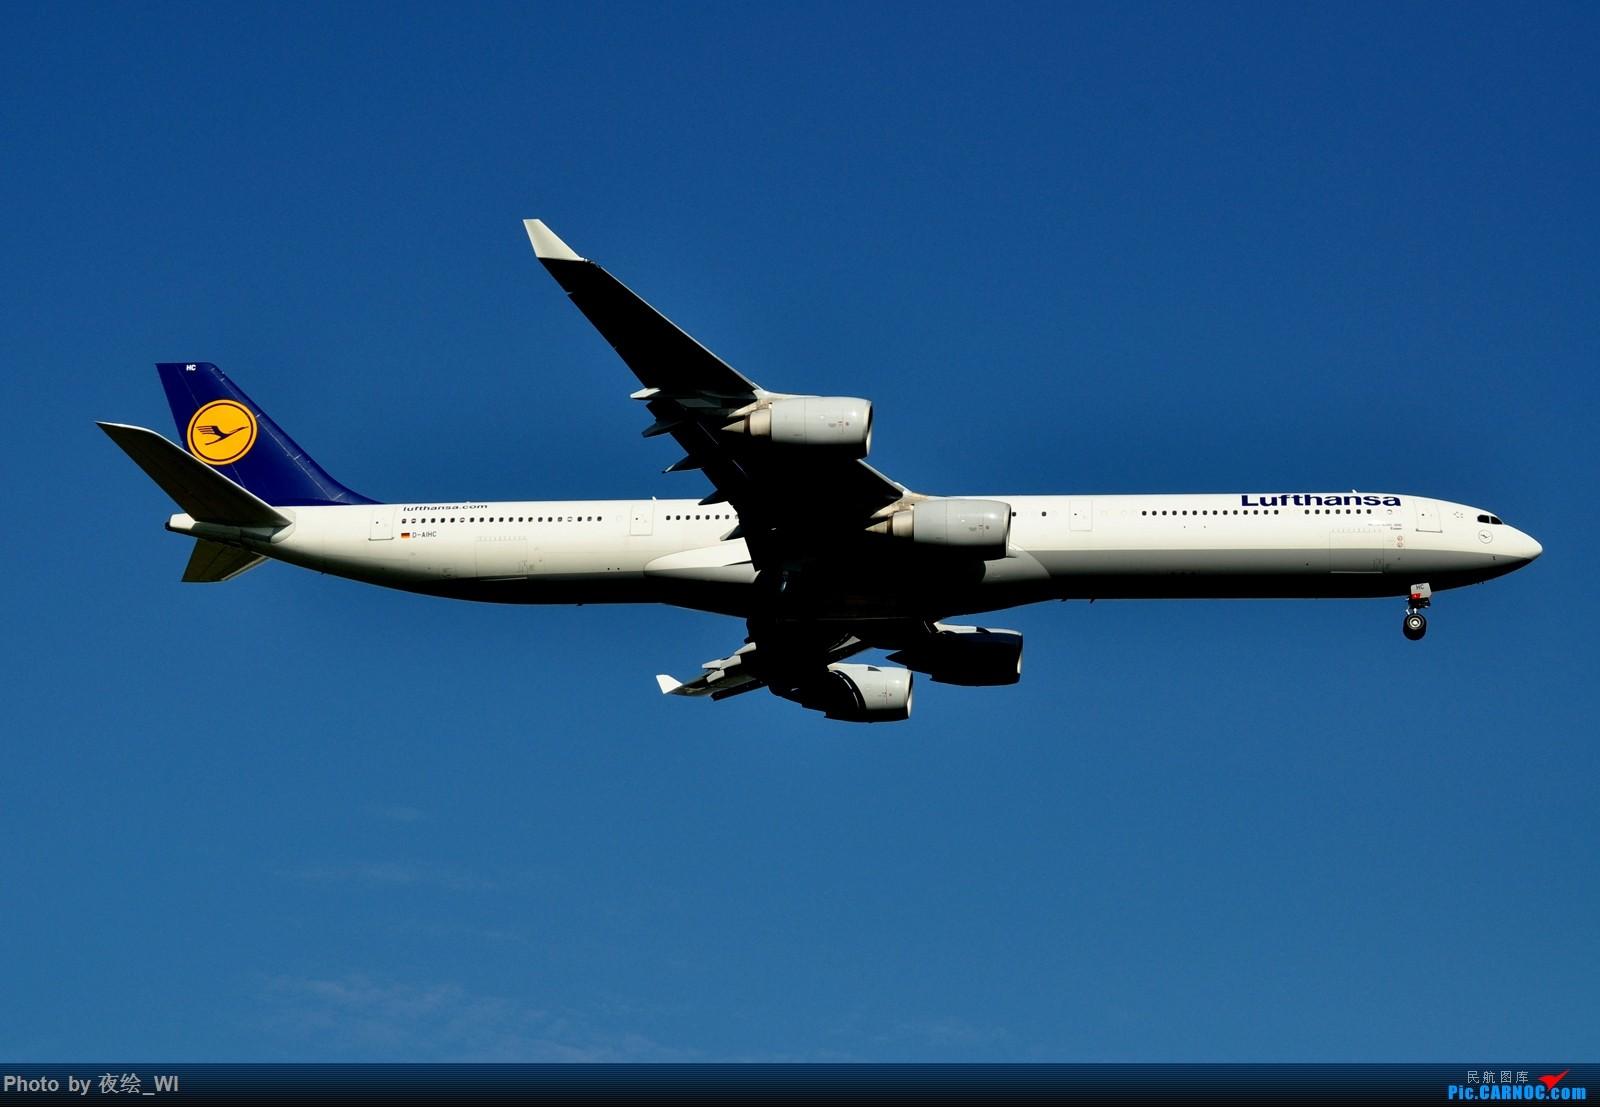 Re:[原创]【PVG】不只守着NKG,国庆疯狂拍机之浦东行,天空美得简直不像话! AIRBUS A340-600 D-AIHC 中国上海浦东国际机场